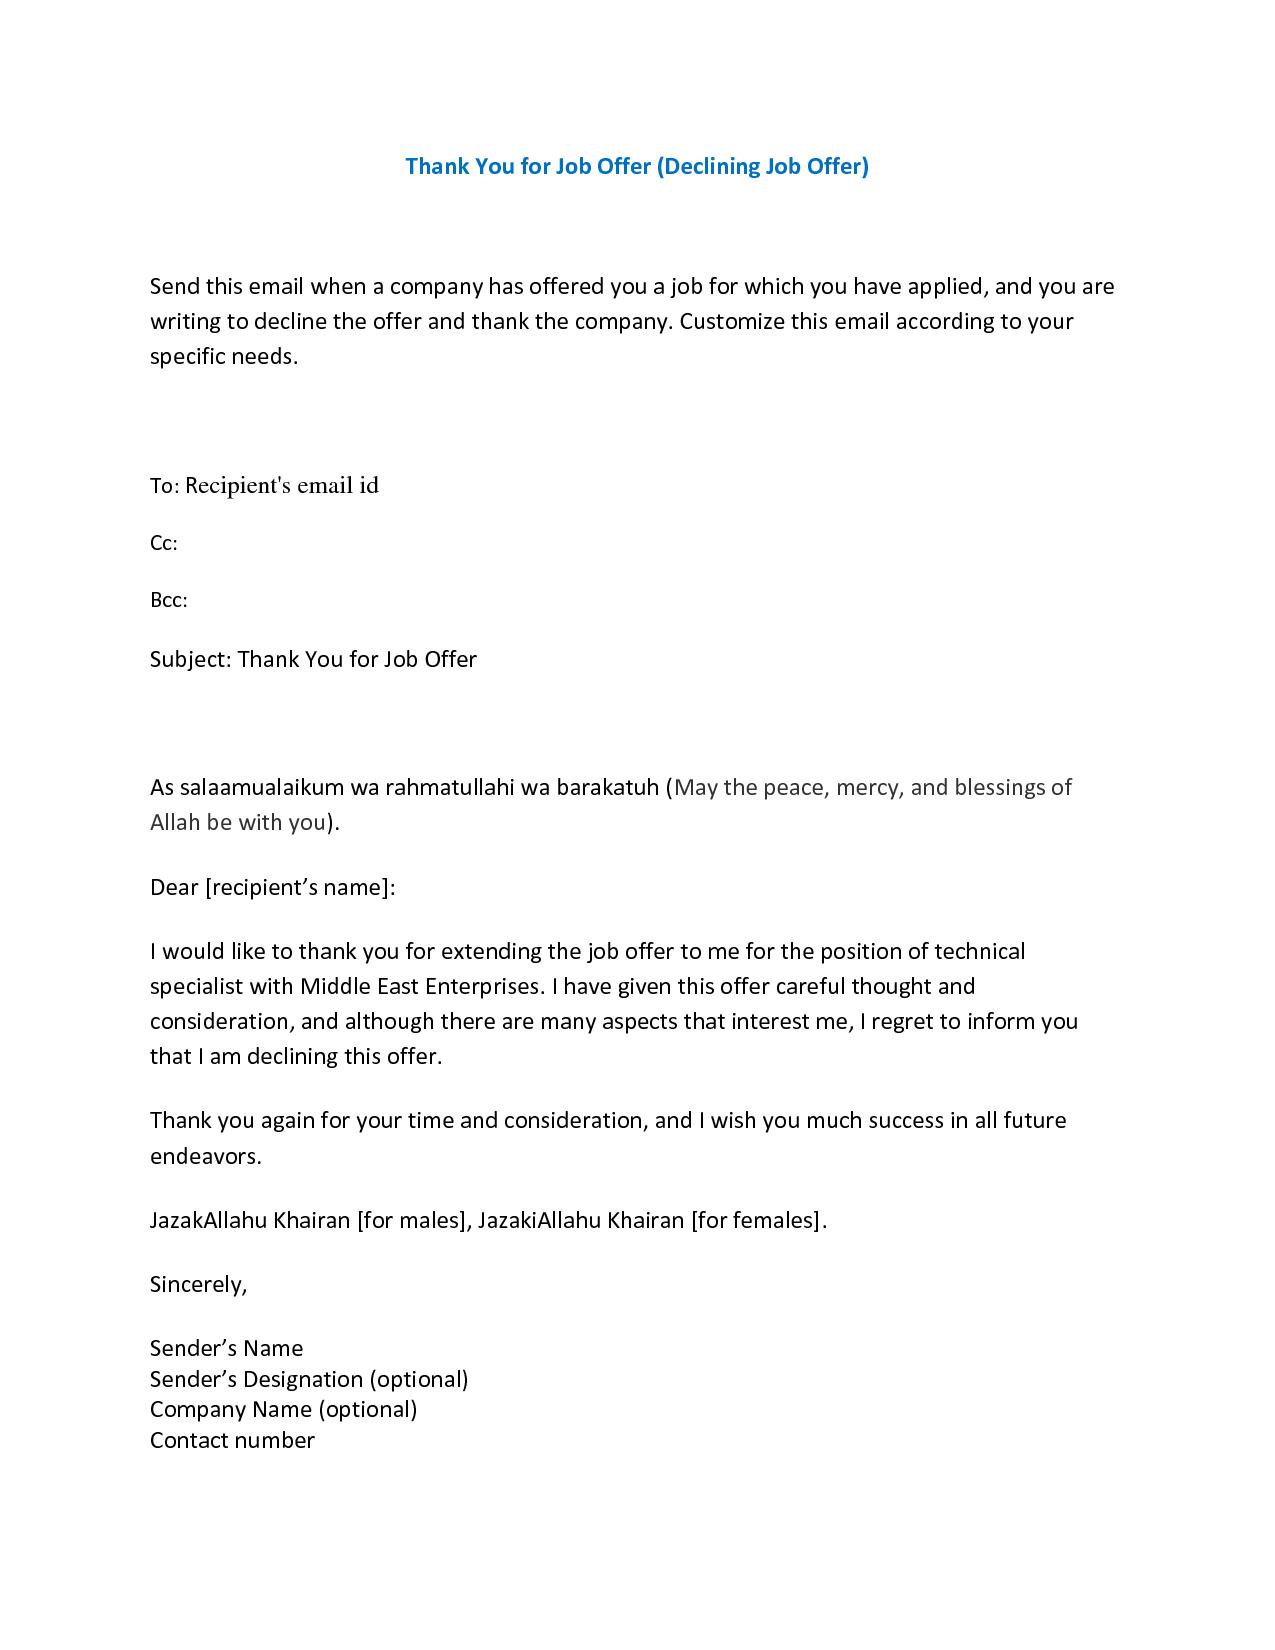 docstoccomThank You For Job Offer Email  77  Pinterest